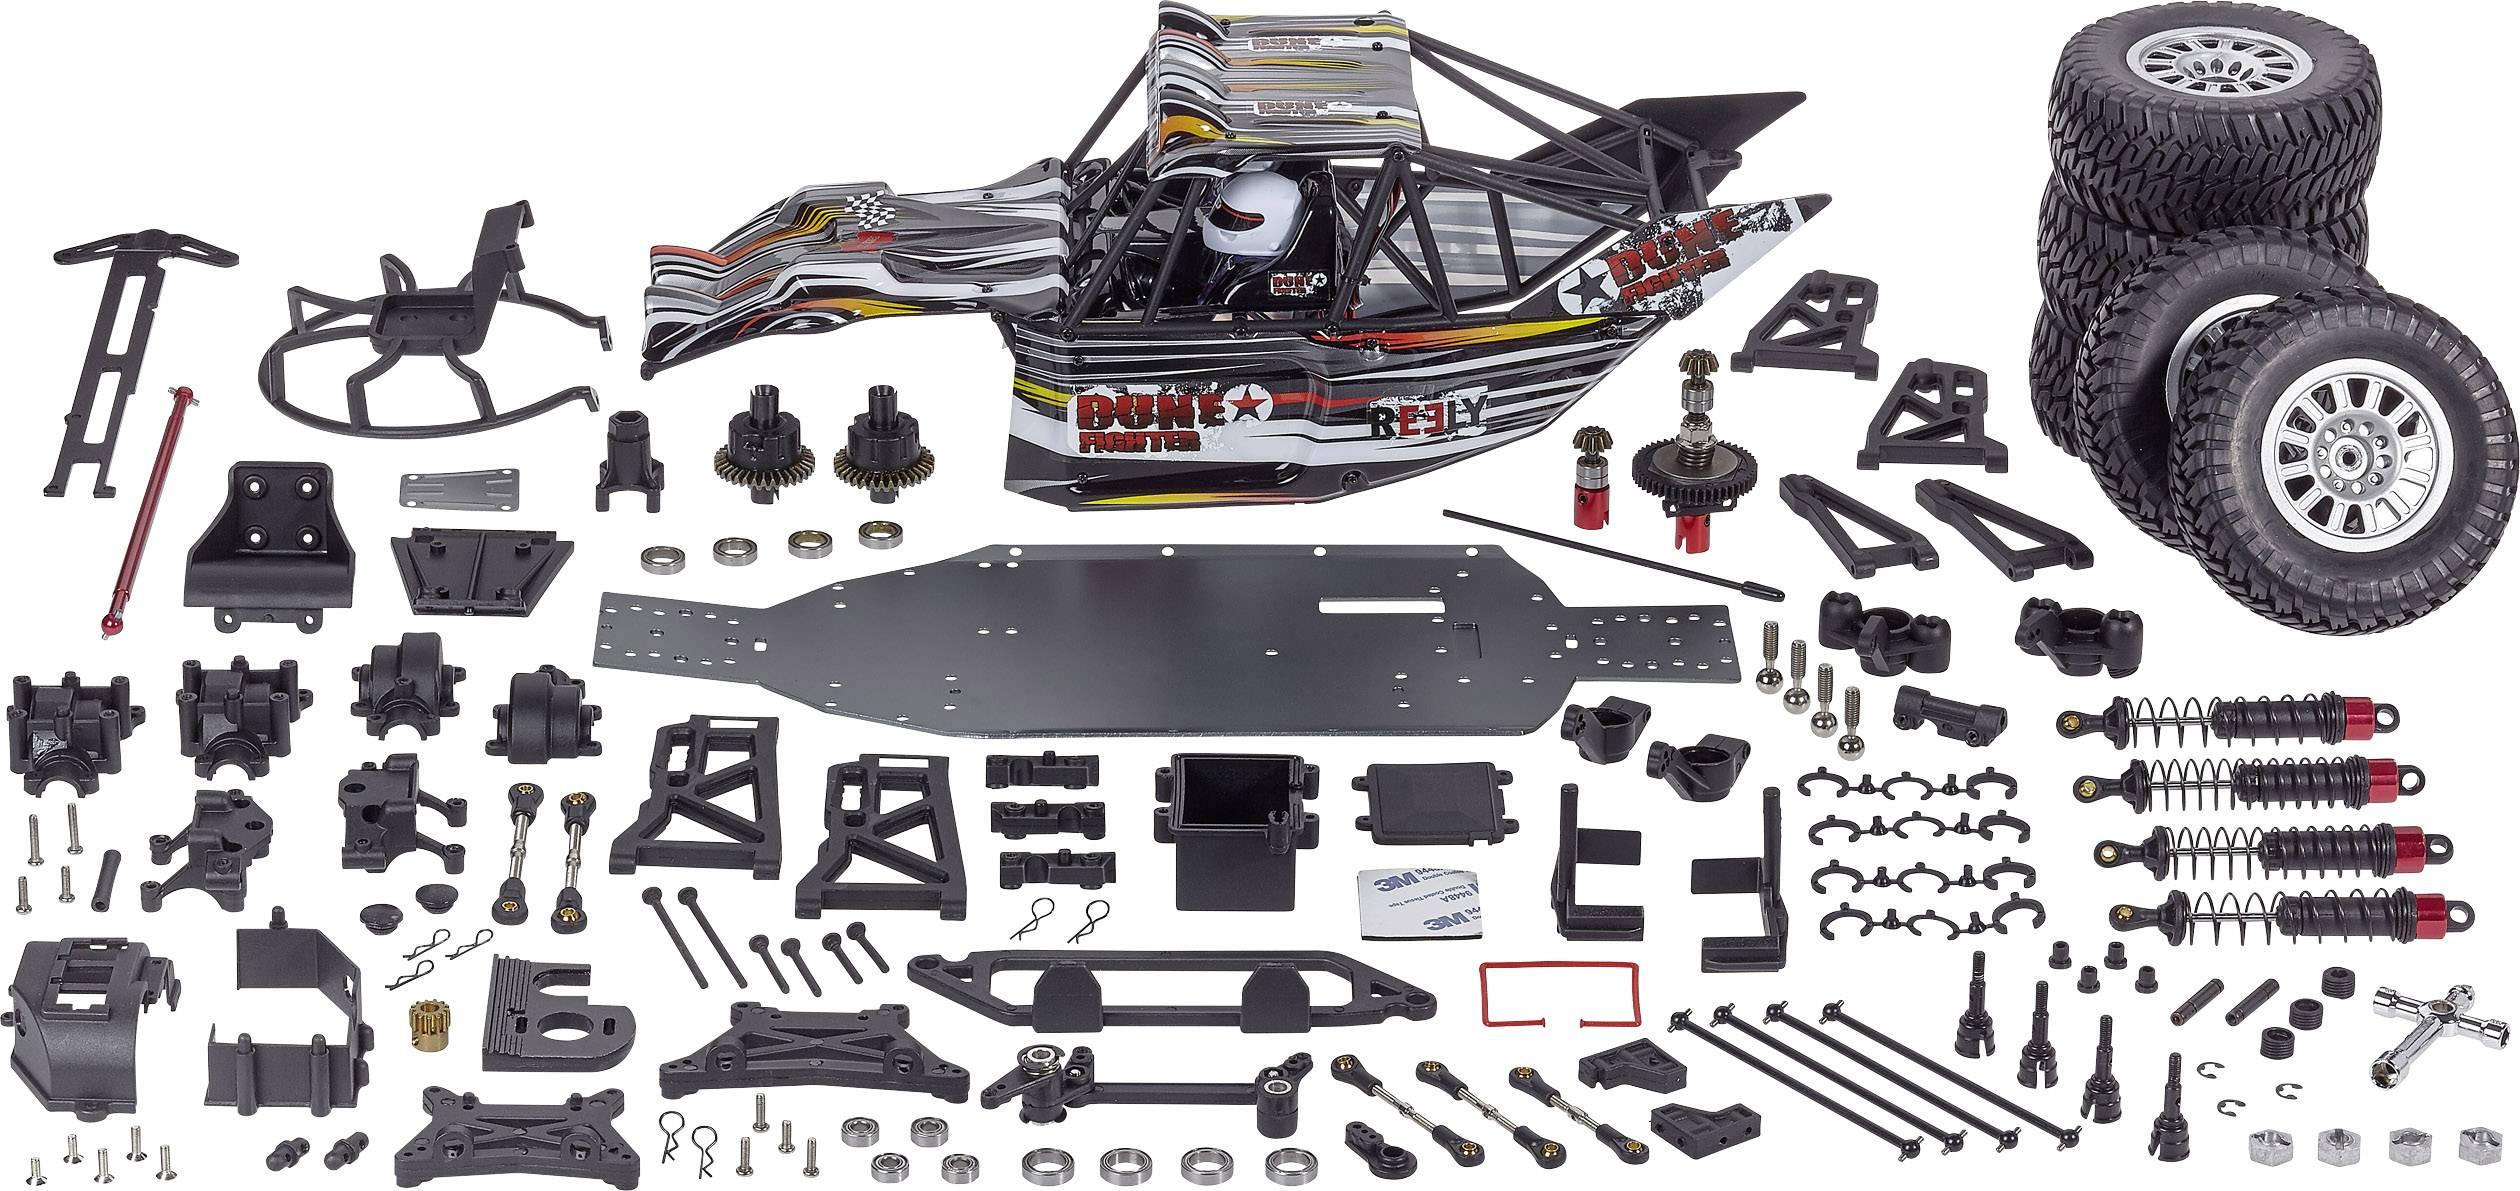 RC model auta Reely Dune Fighter 1:10 elektrický Buggy 4WD (4x4) stavebnice